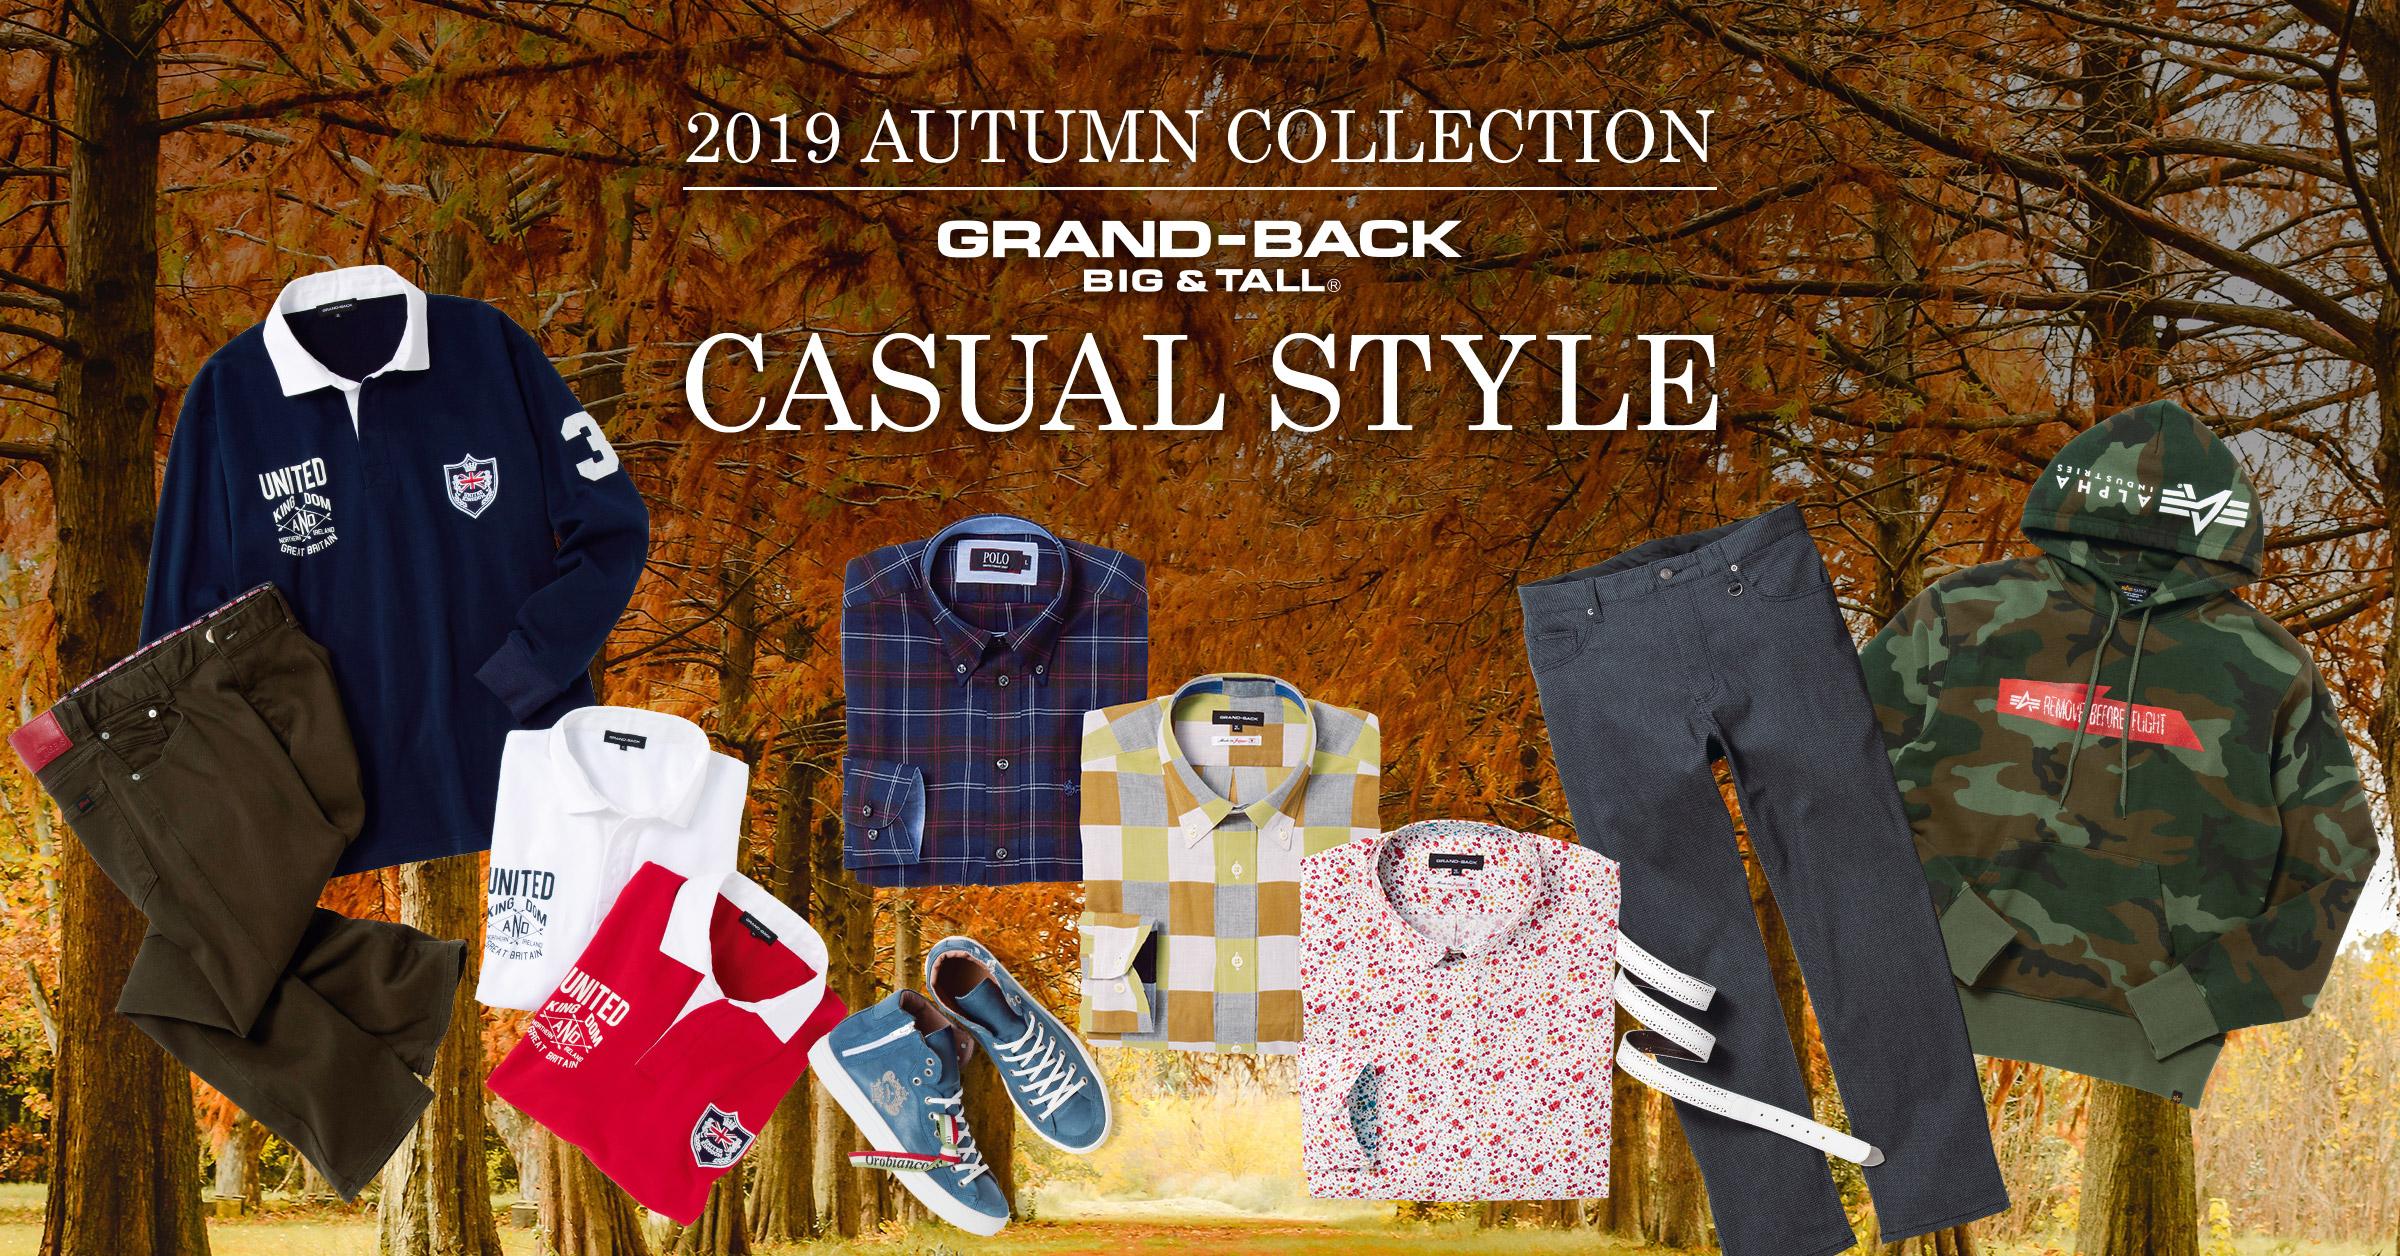 2019 Autumn Casual style